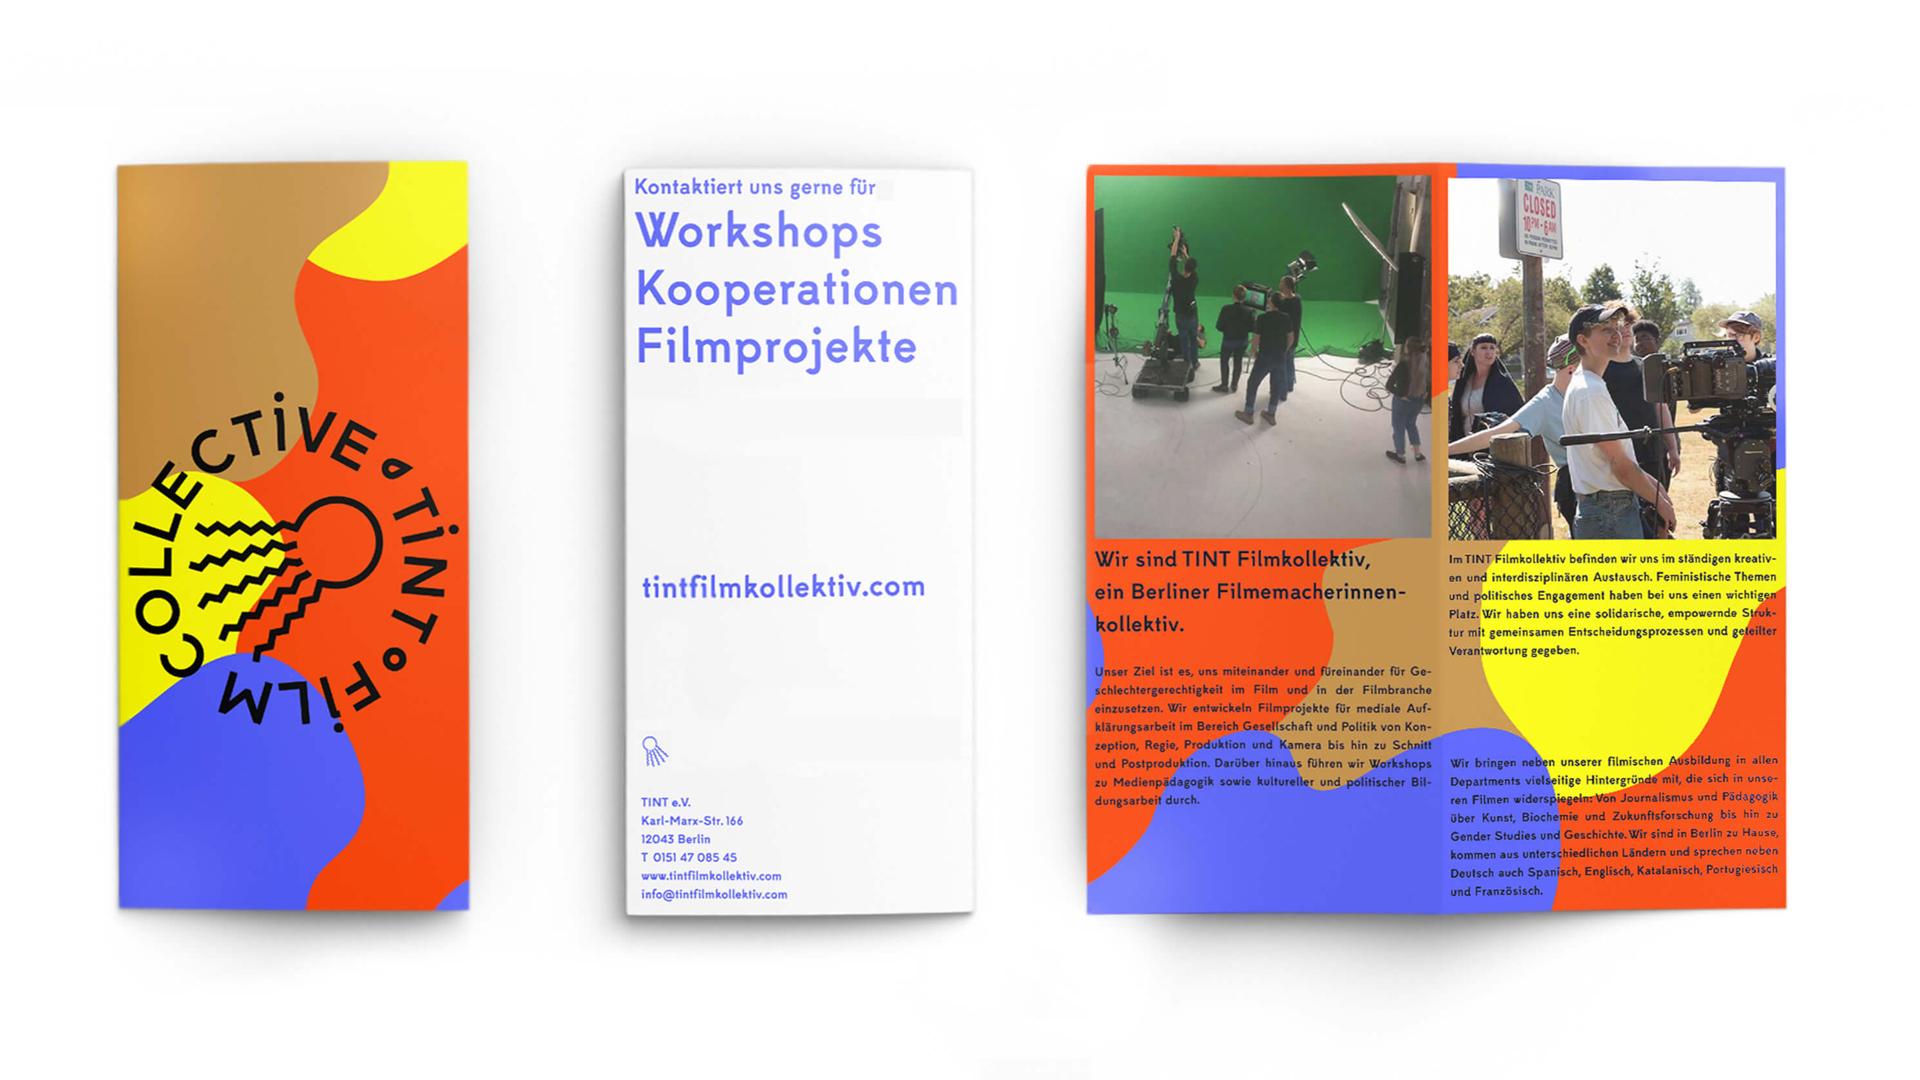 logo identity tint film collective julia boehme studio goof studiogoof juliaboehme